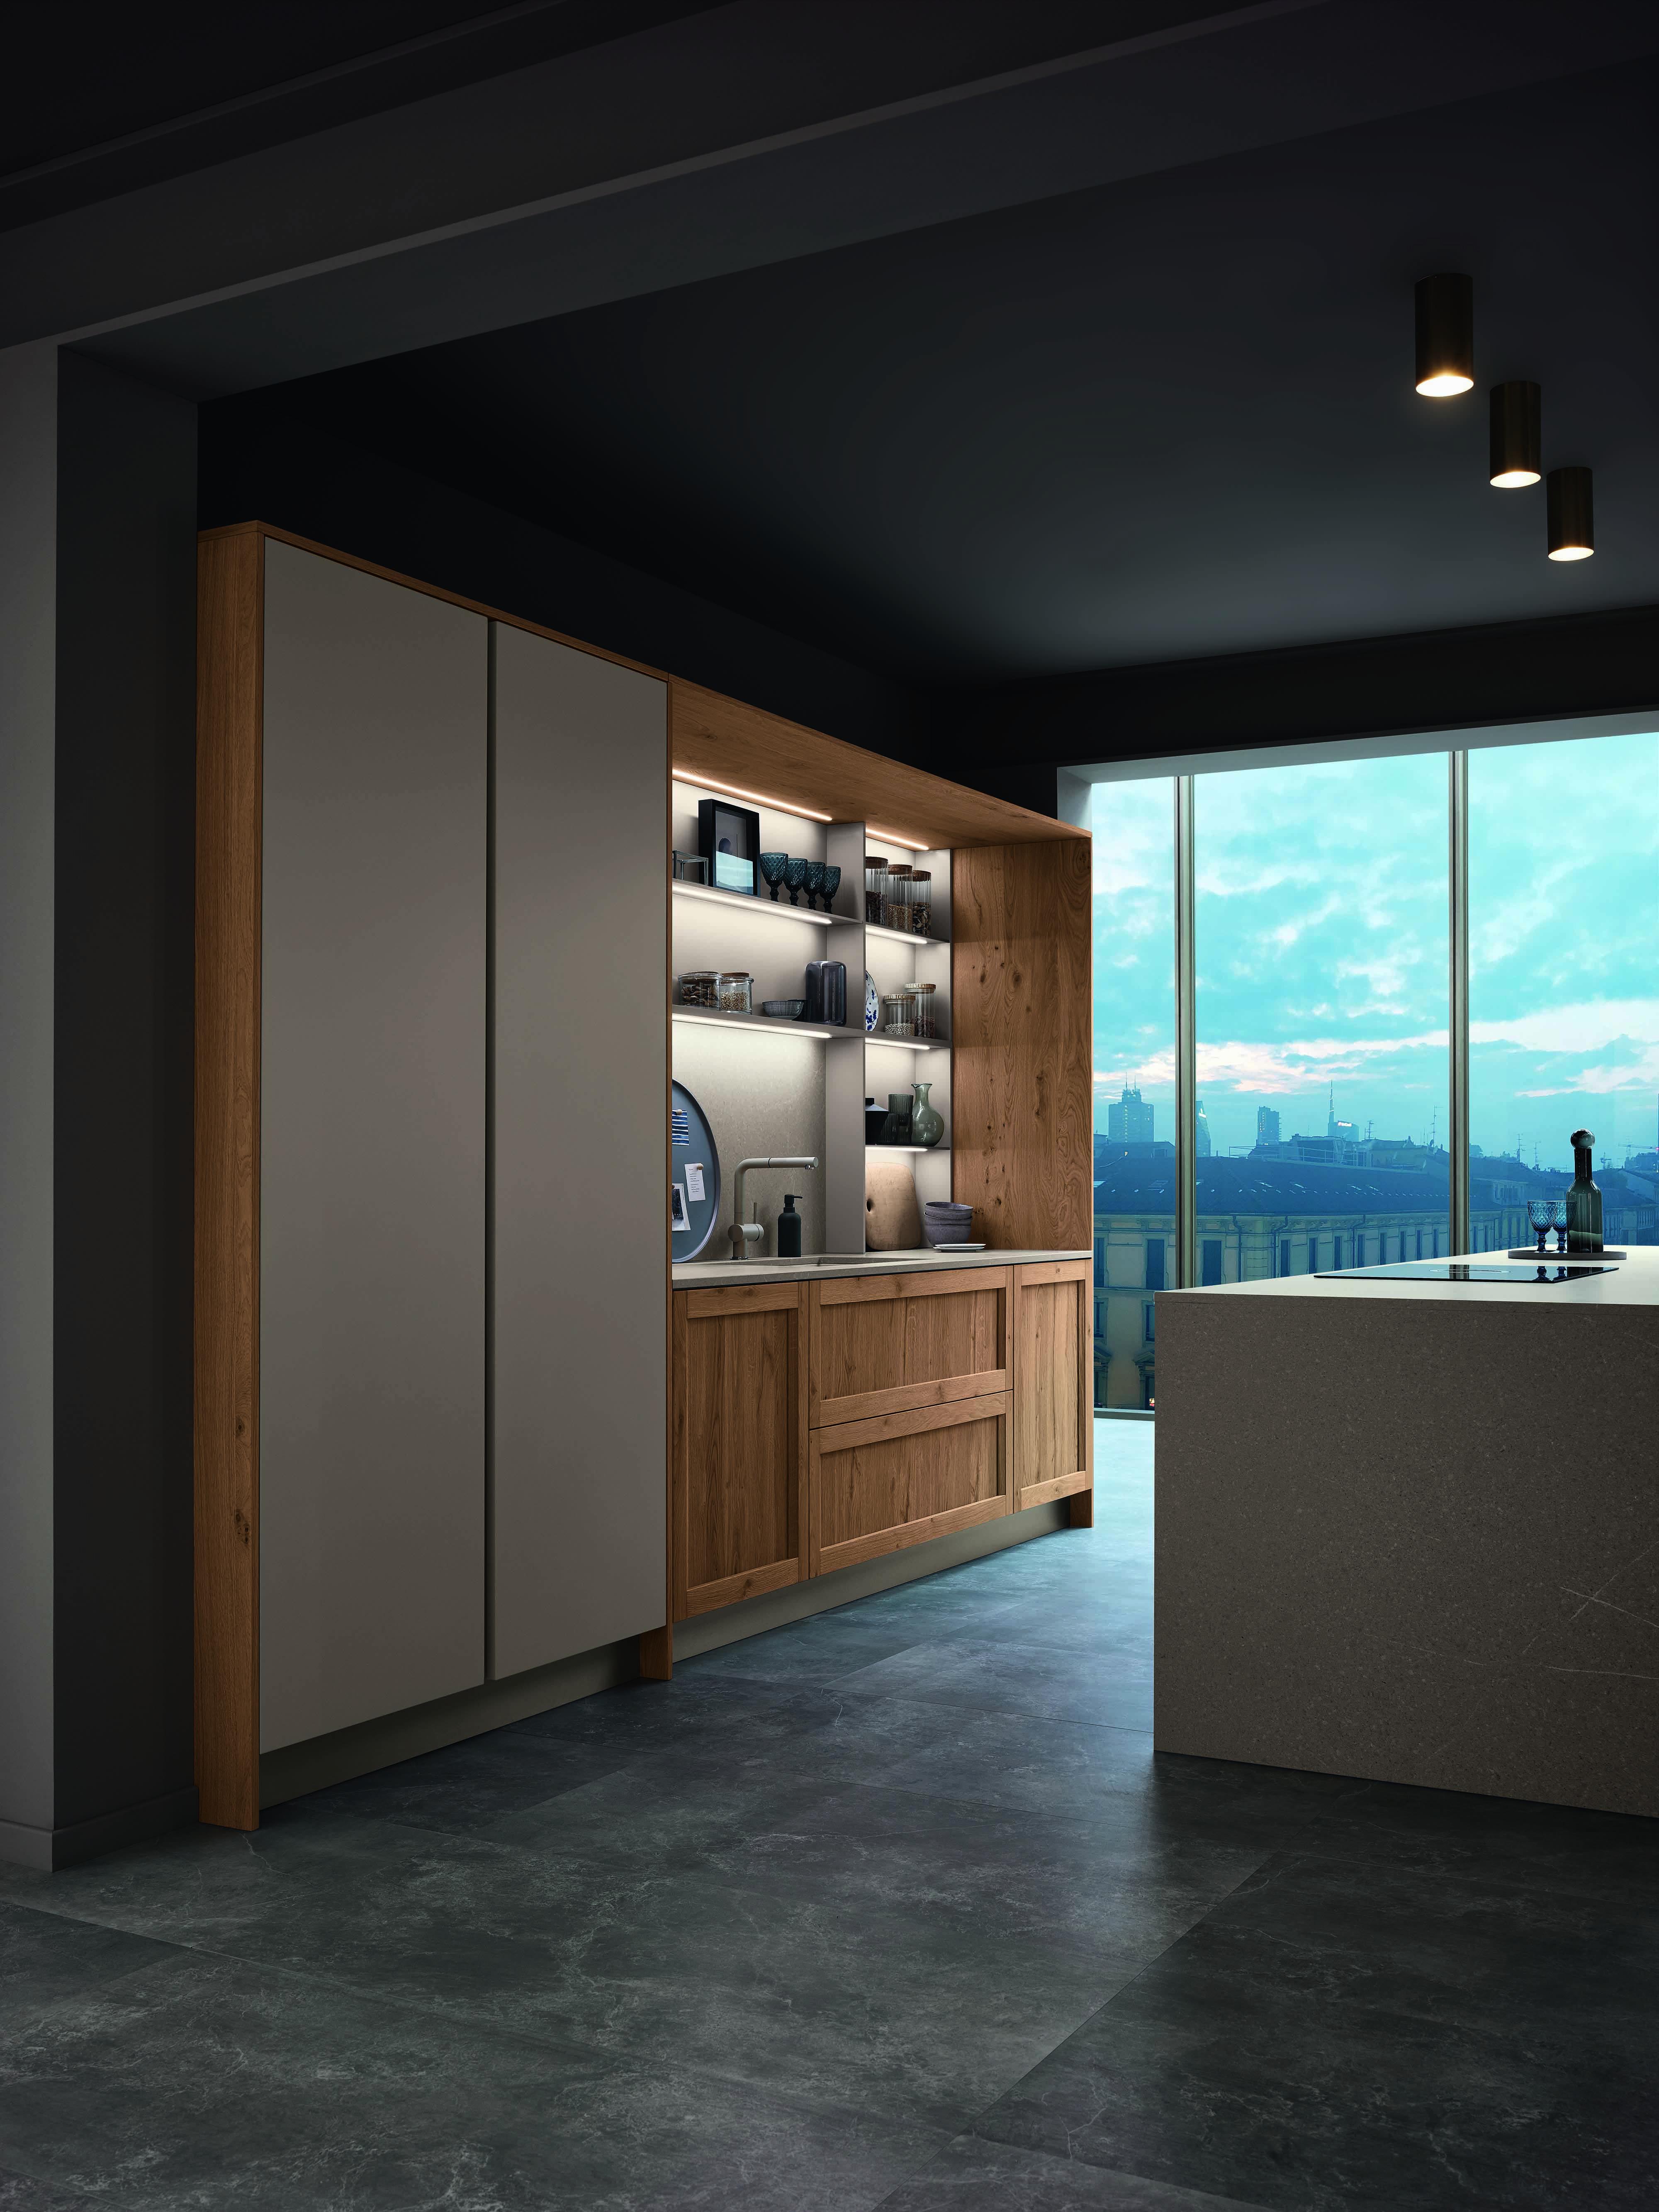 Spot Veneta Cucine.Interior Lighting Design Inspiration Given By The New Veneta